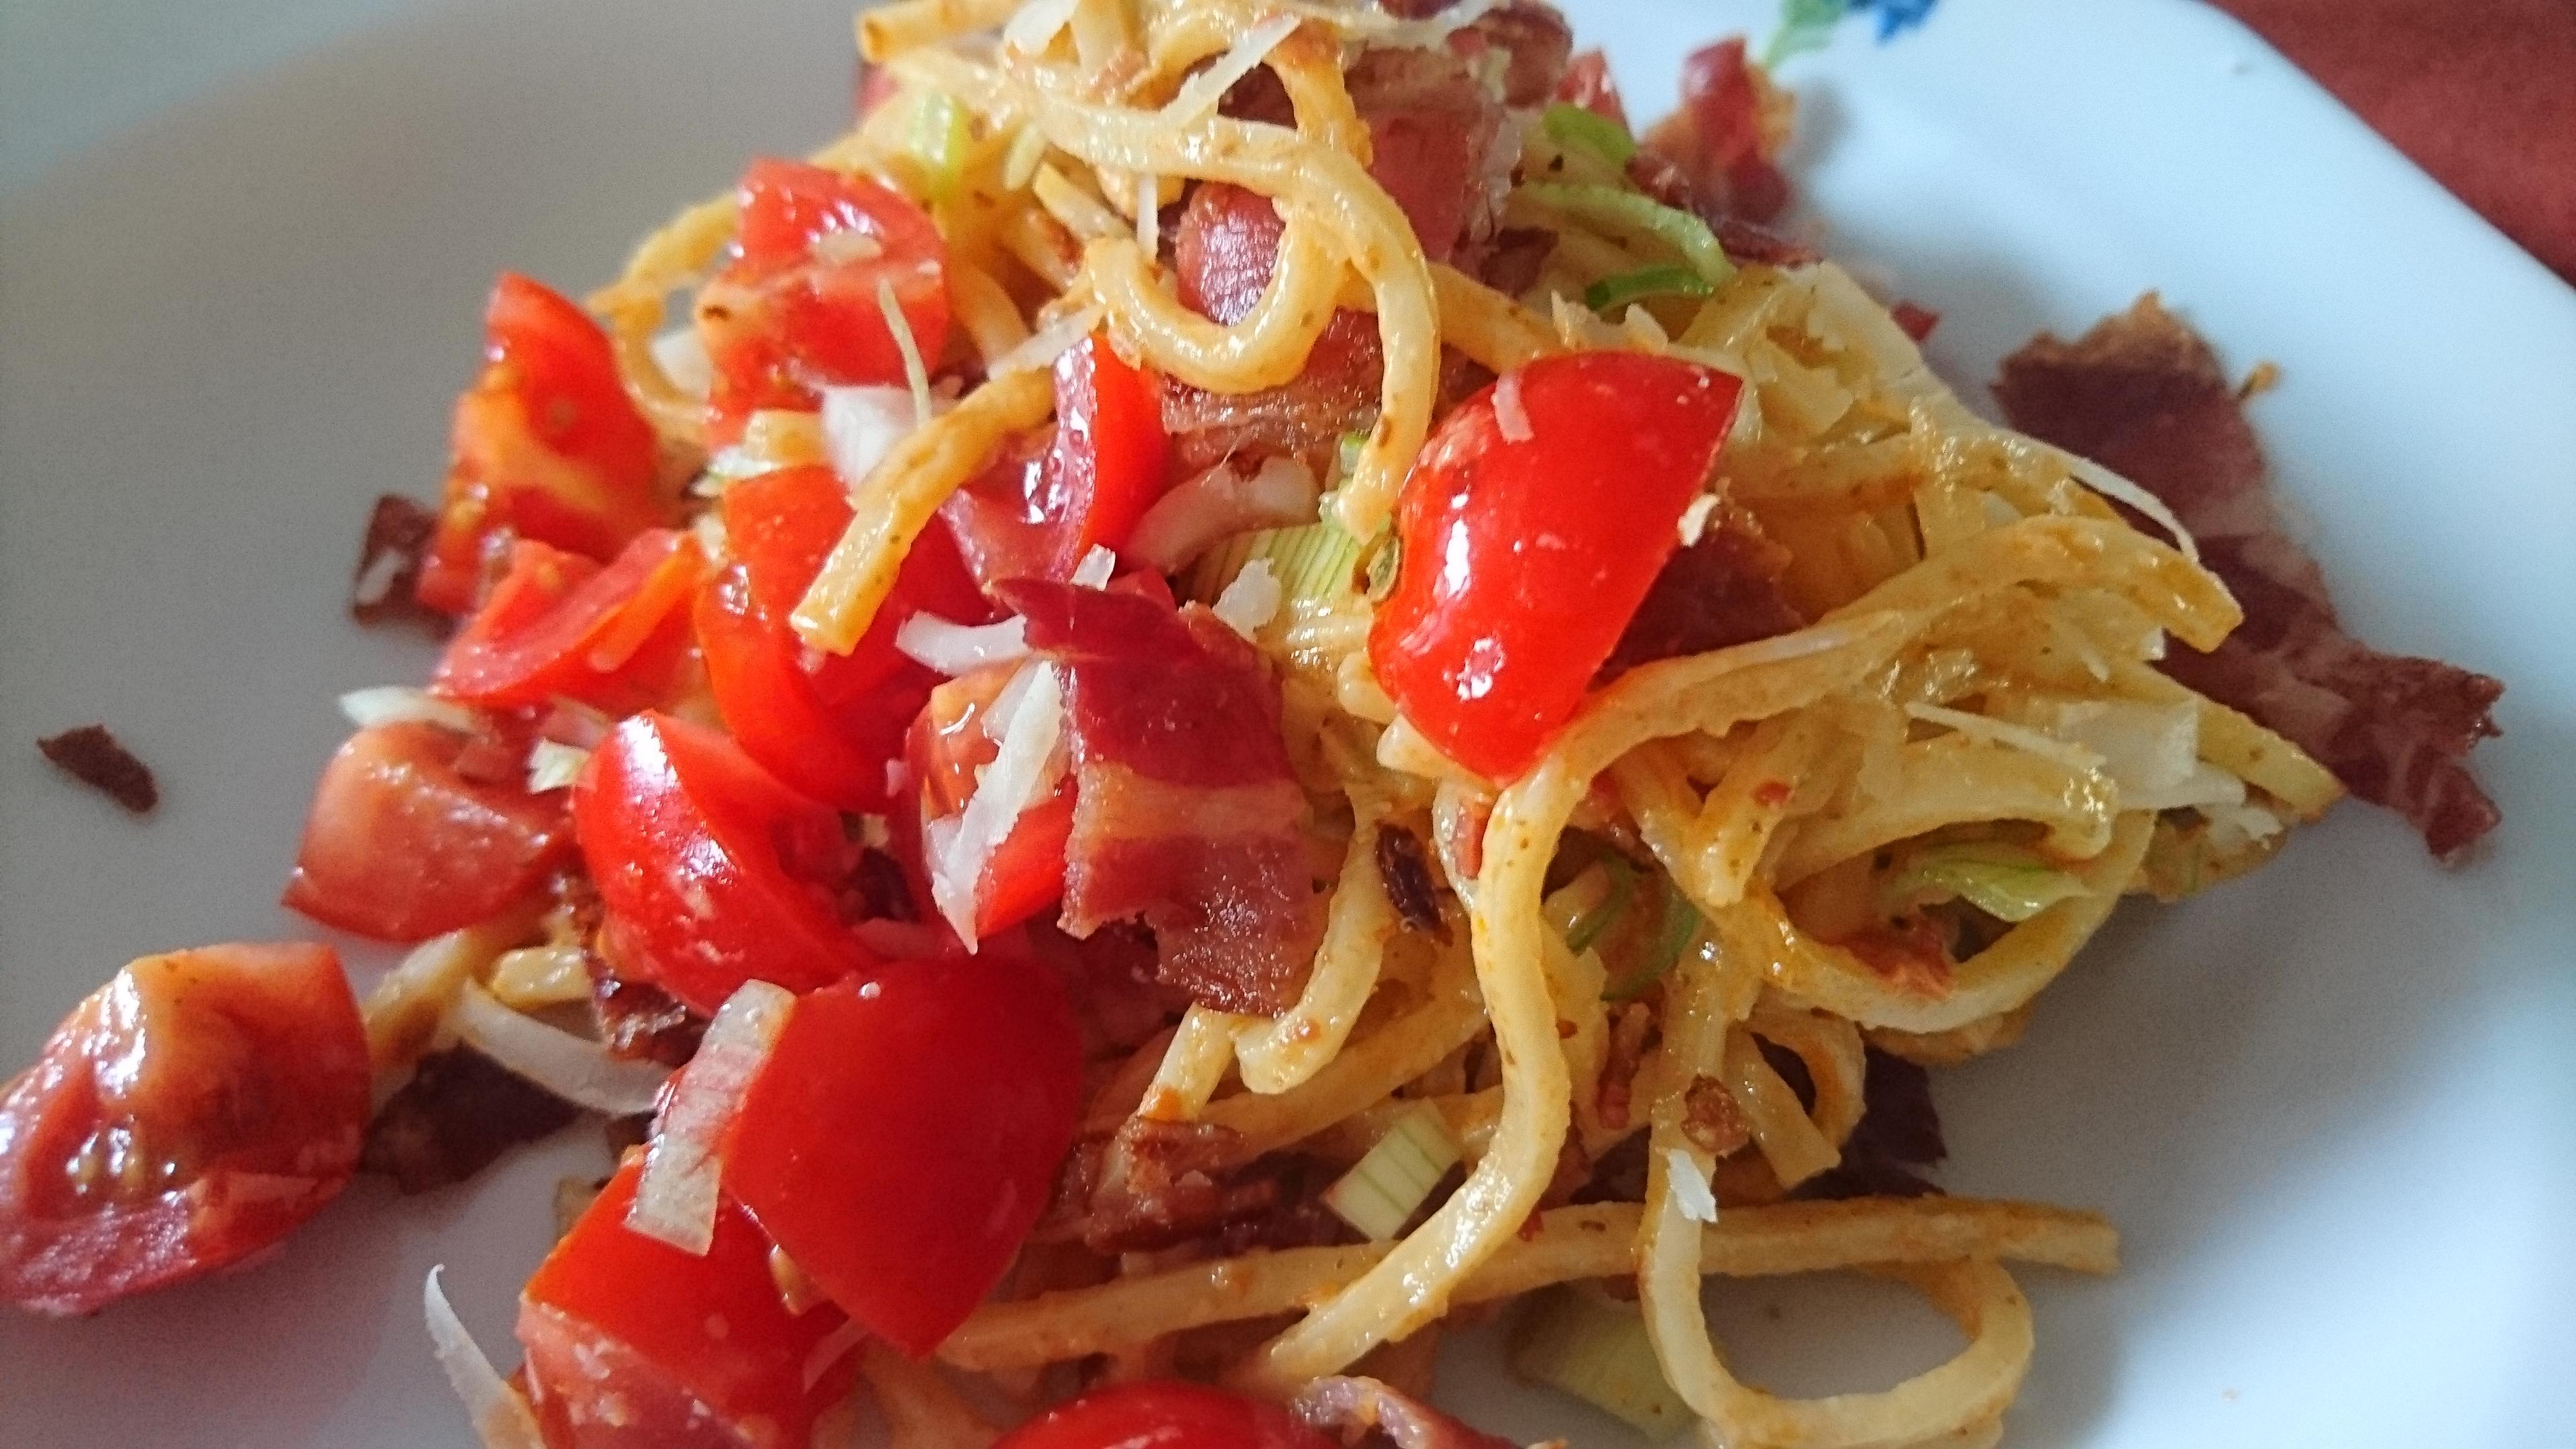 Snabb pasta med tomatpesto